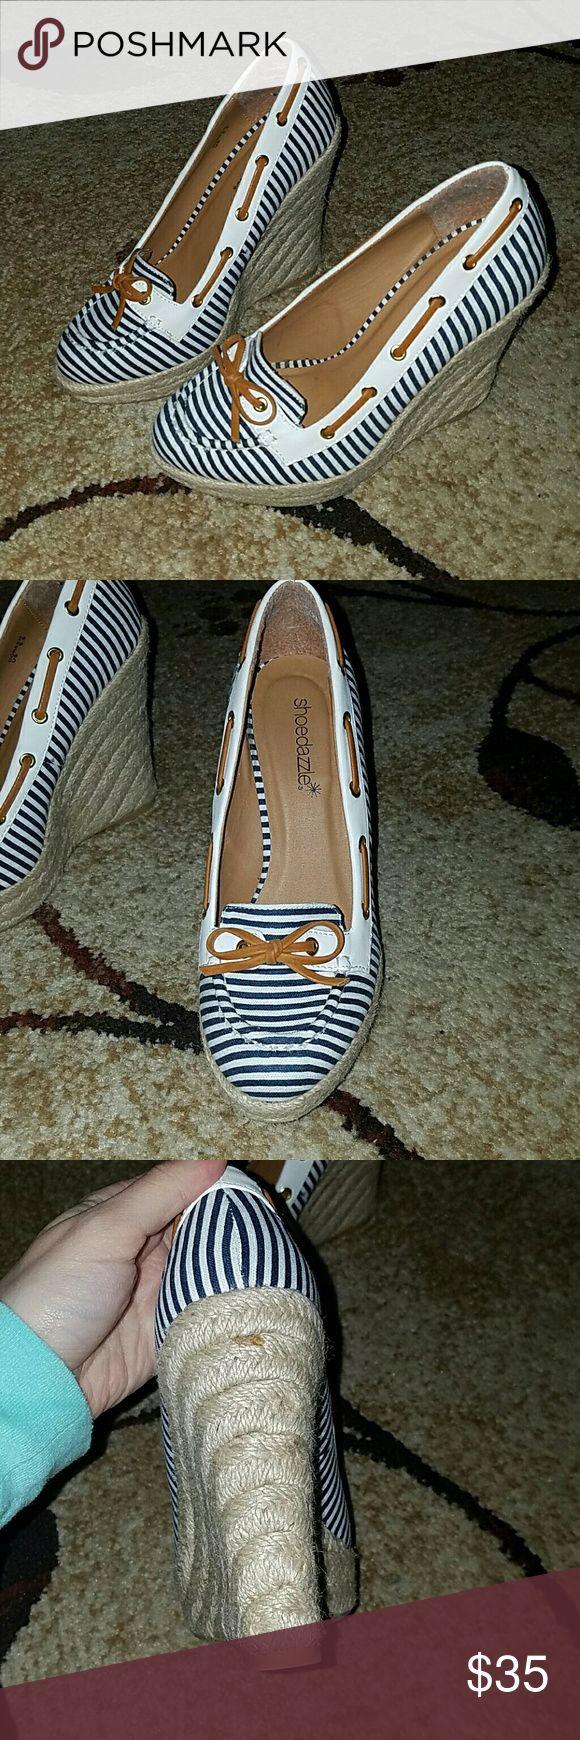 Nautical shoes In excellent condition nautical wedges Shoe Dazzle Shoes